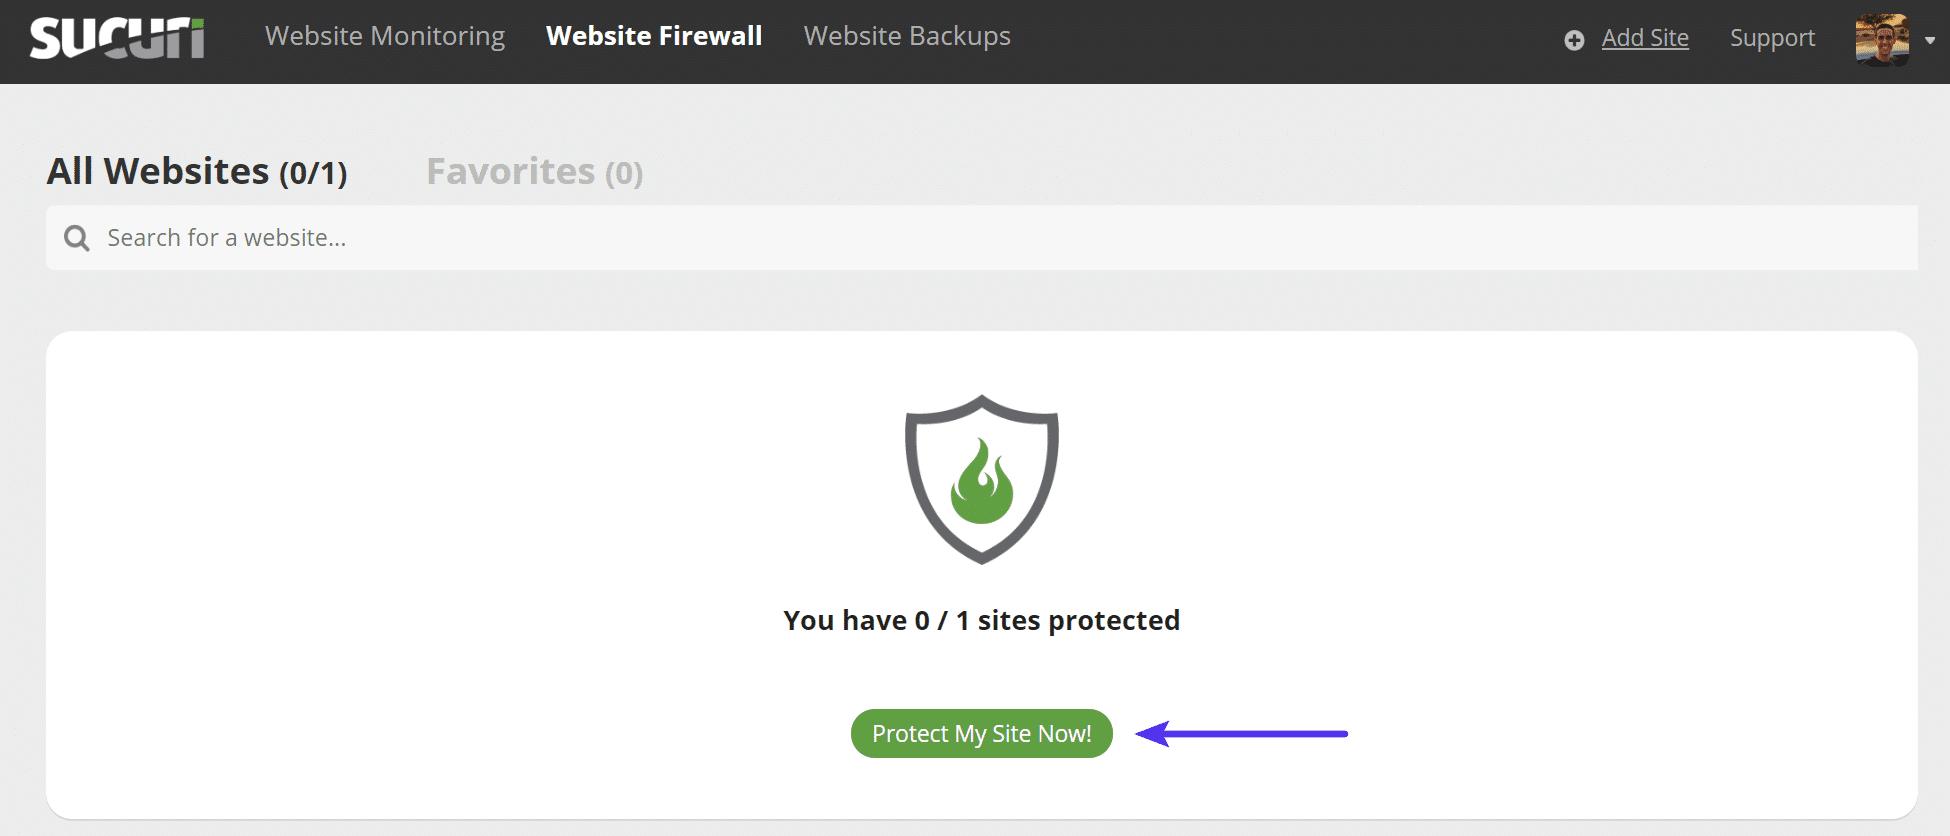 Cara mengatur Sucuri Firewall